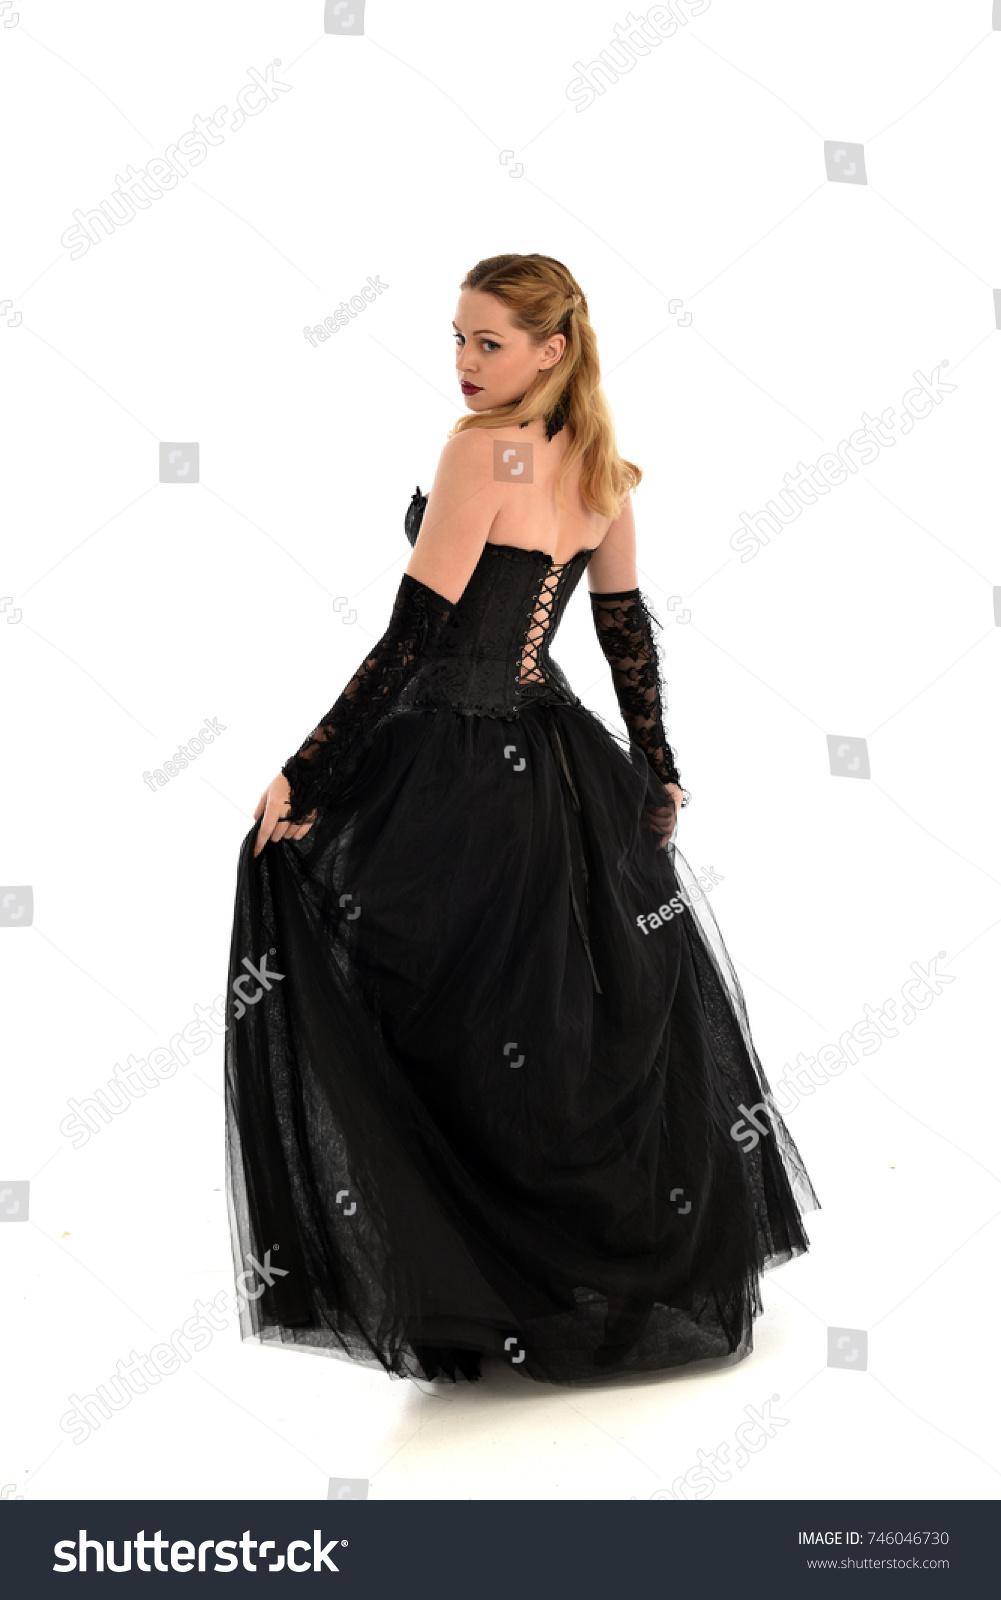 Full Length Portrait Blonde Girl Wearing Stock Photo (Edit Now ...